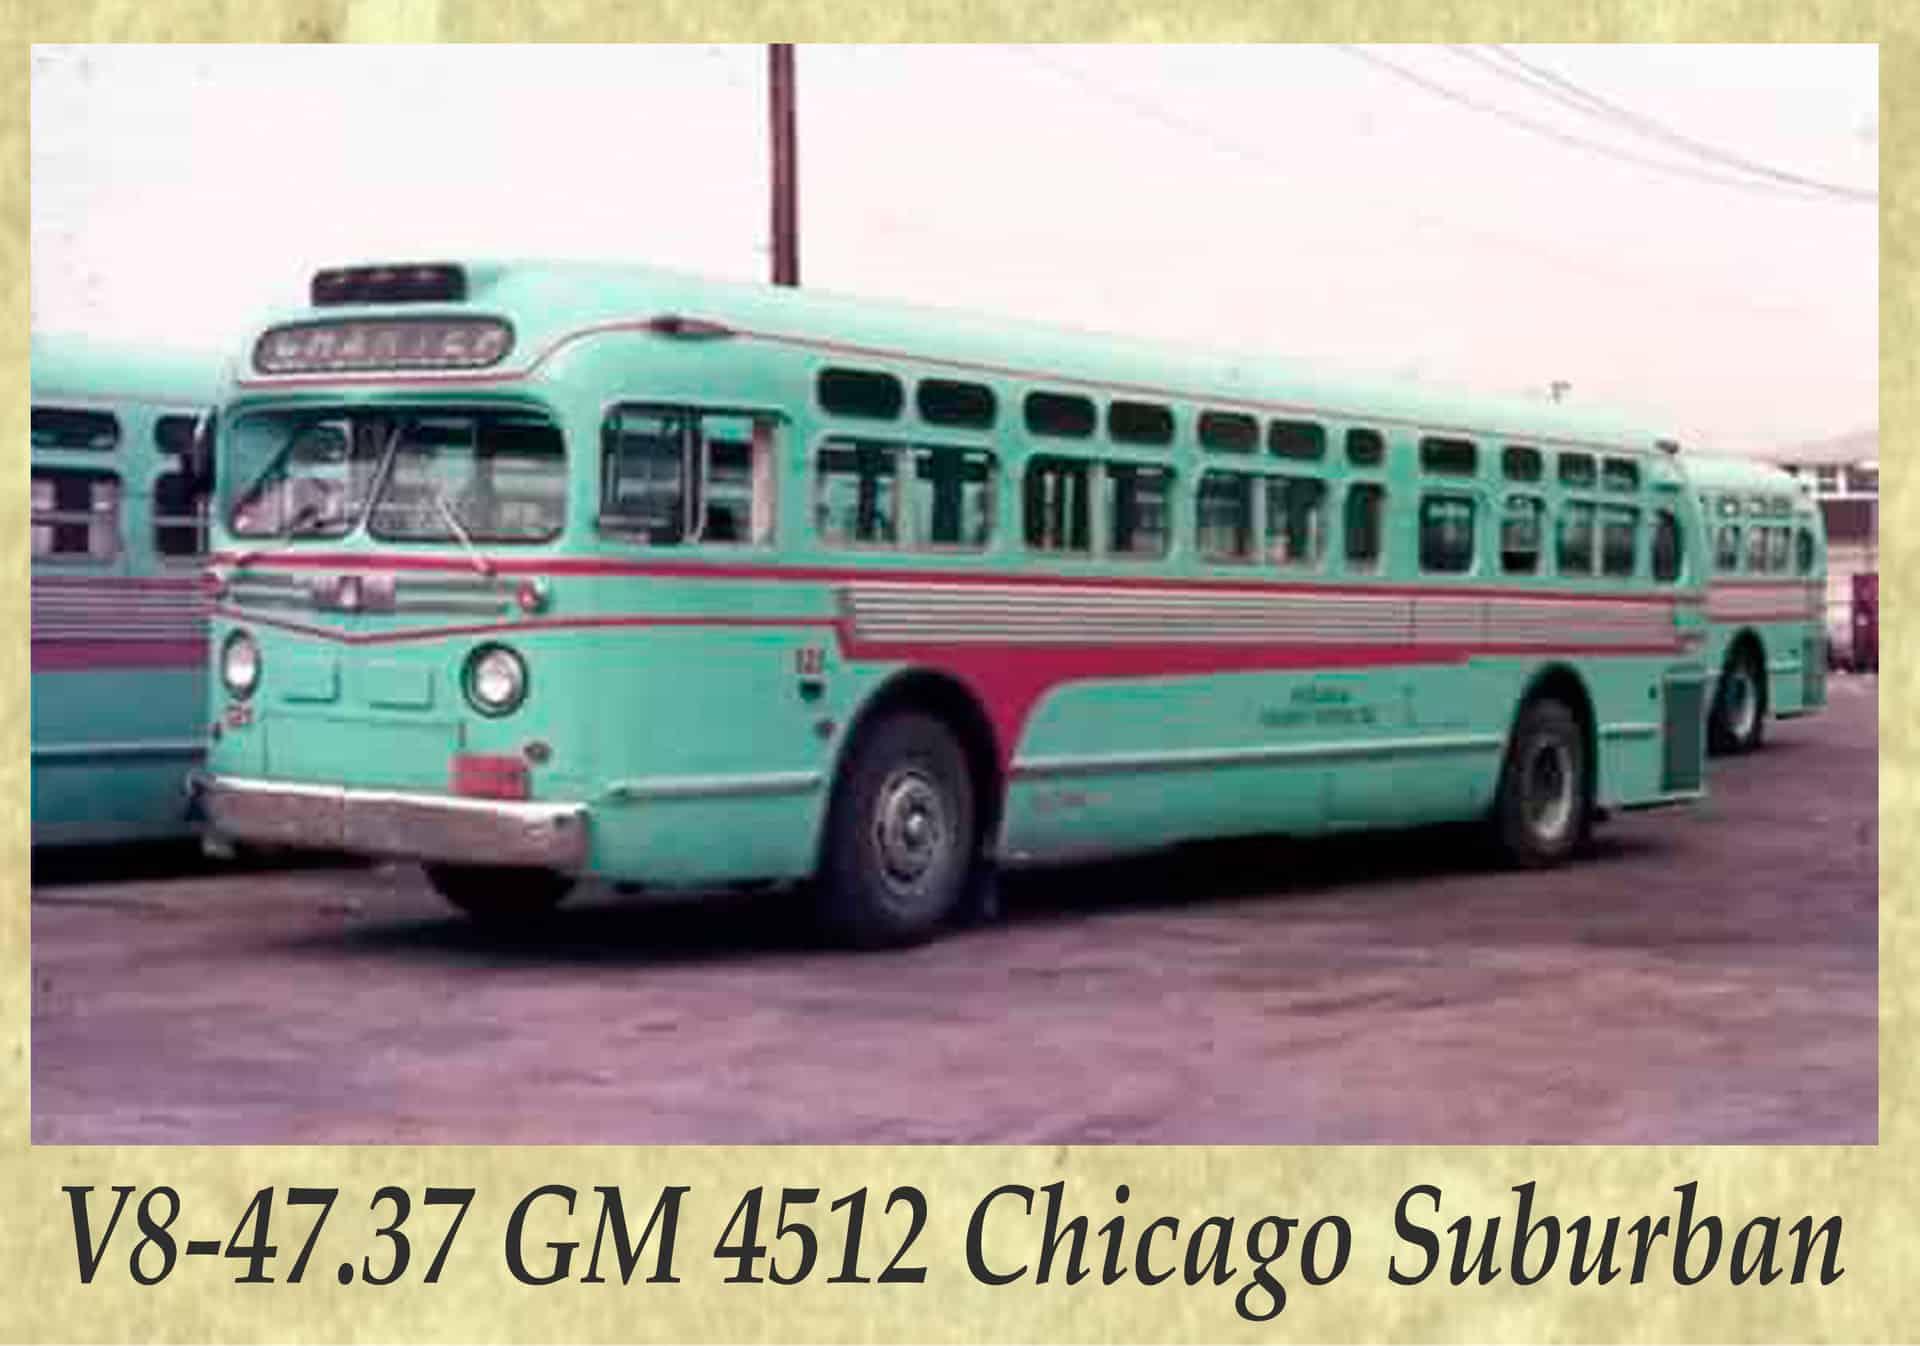 V8-47.37 GM 4512 Chicago Suburban